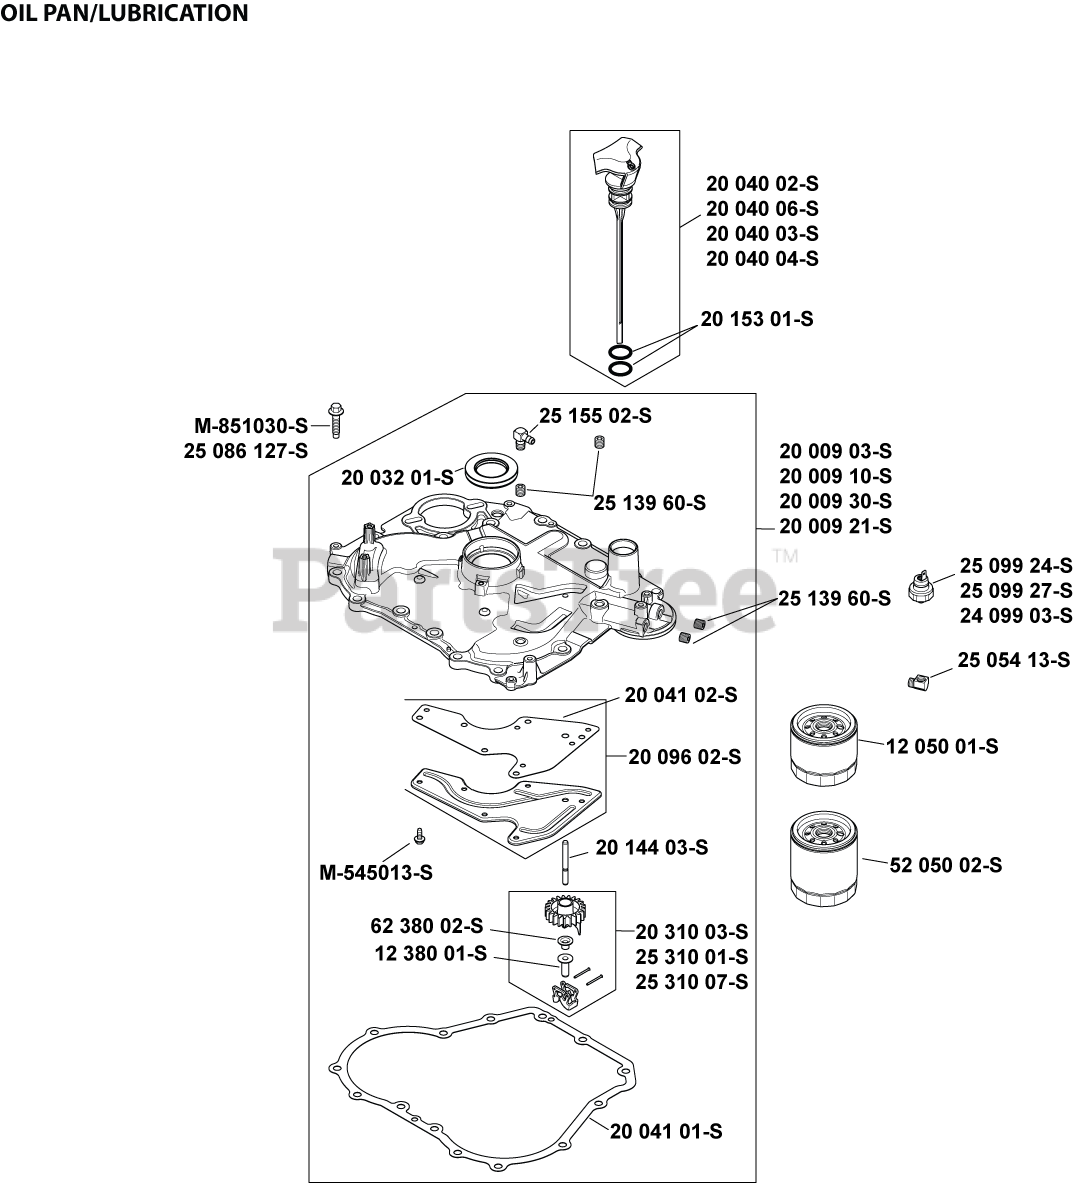 kohler sv600-3220 - kohler courage single engine, made for mtd ... kohler courage engine parts diagram  partstree